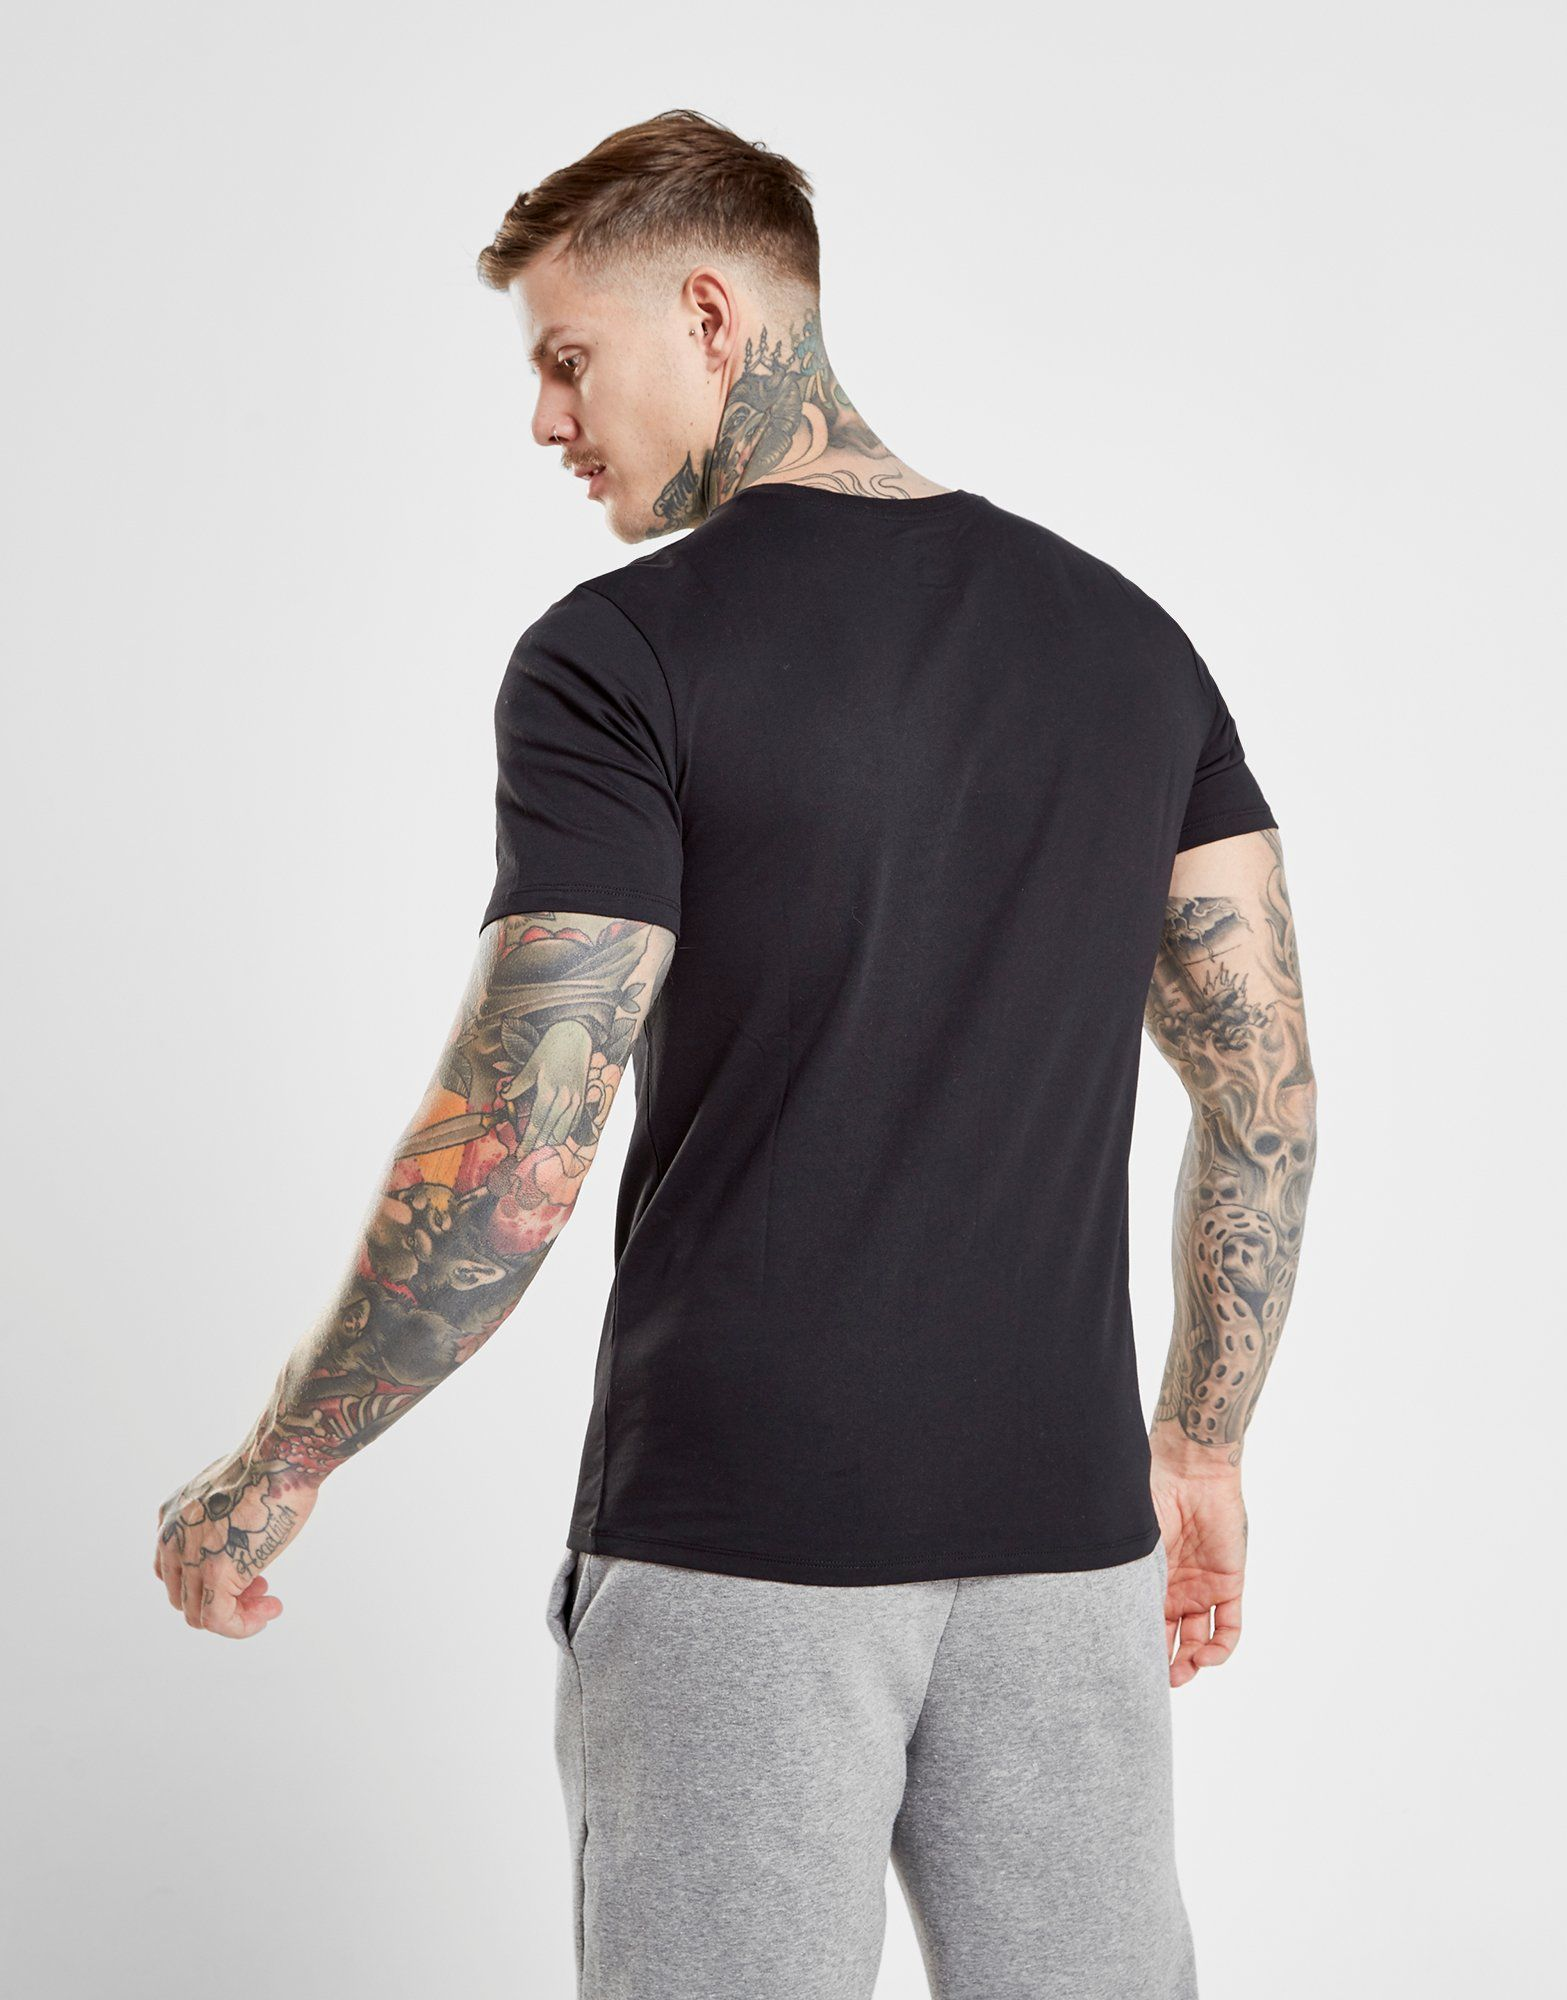 Jordan GOAT T-Shirt